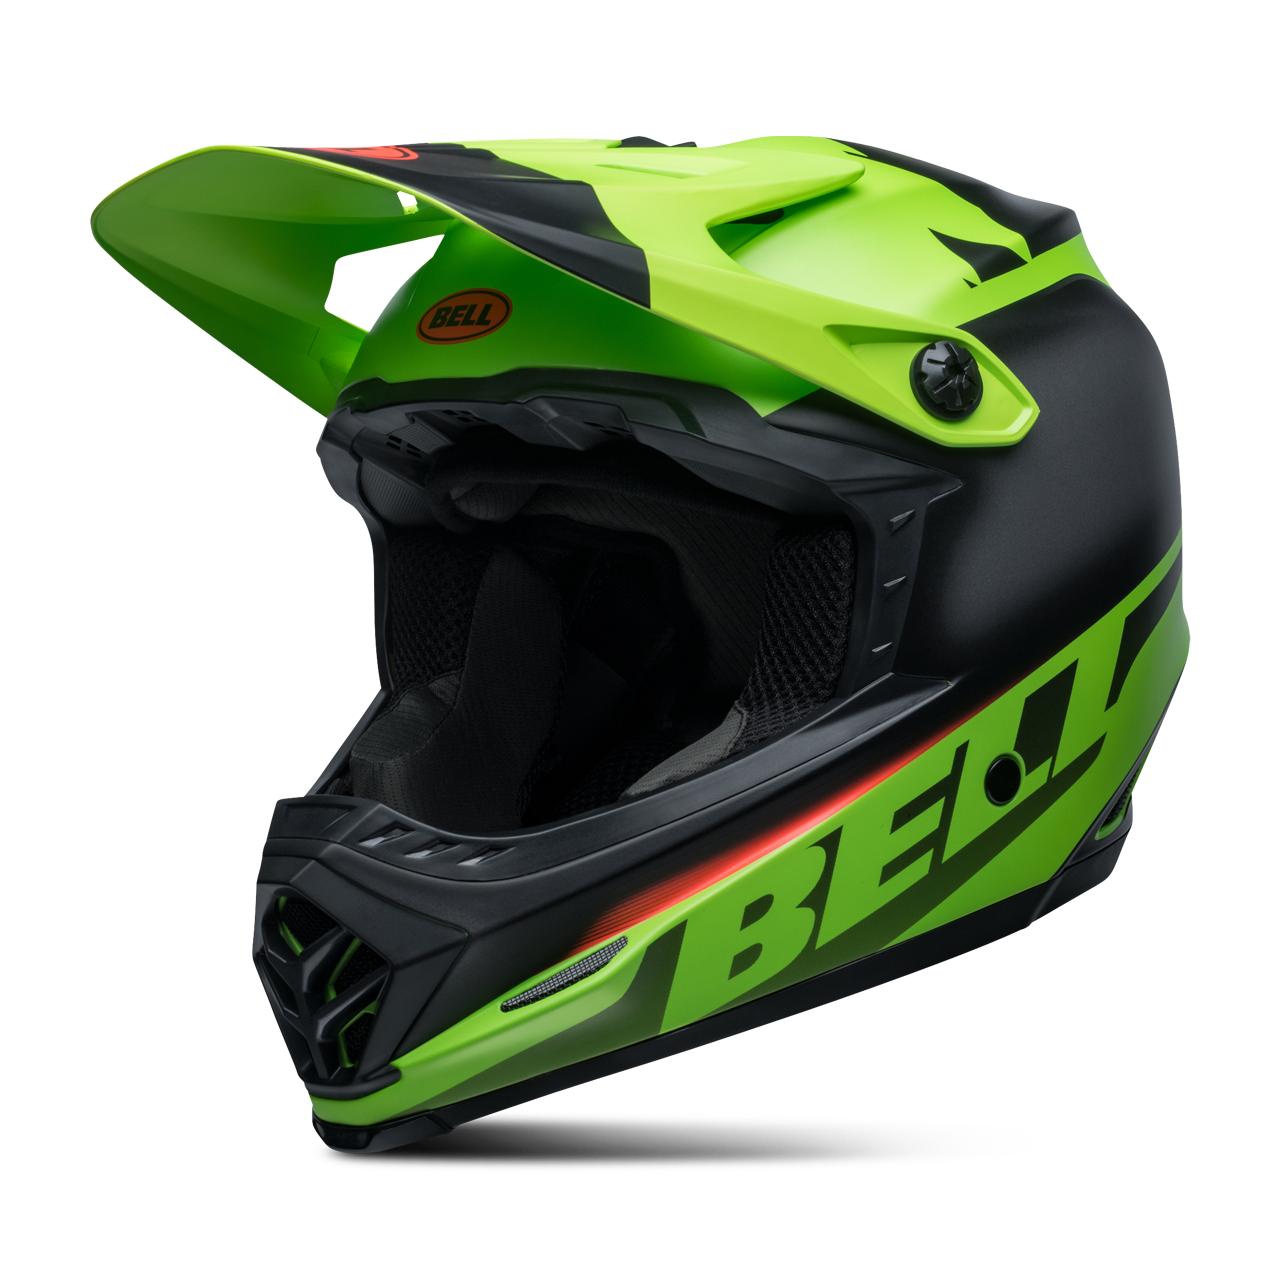 Bell Casco Cross Bambino  Moto-9 Mips Glory Rosso-Nero-Verde